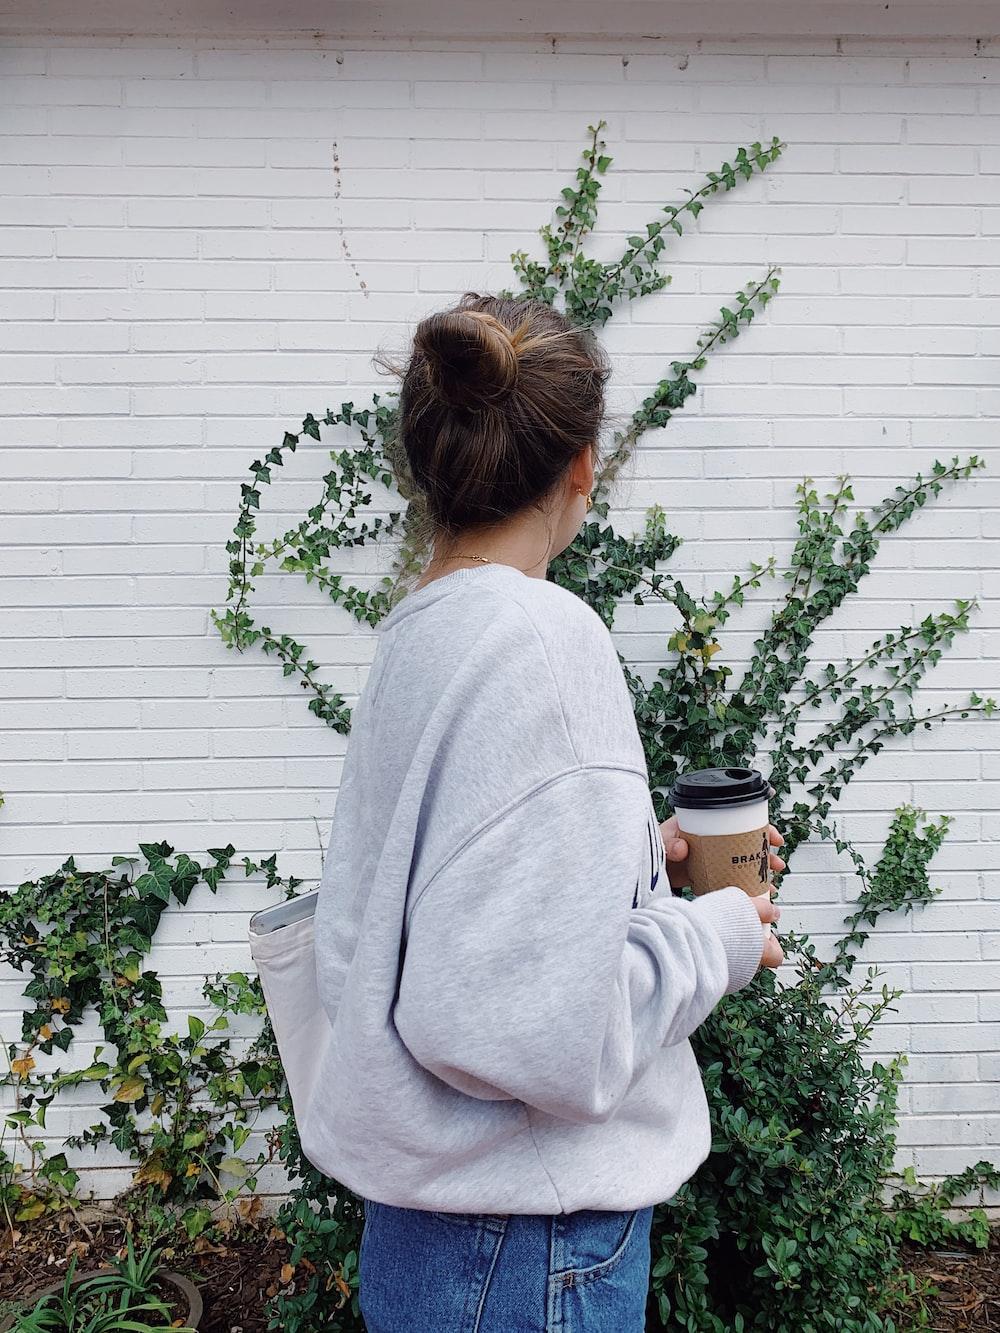 woman in gray sweater holding mug